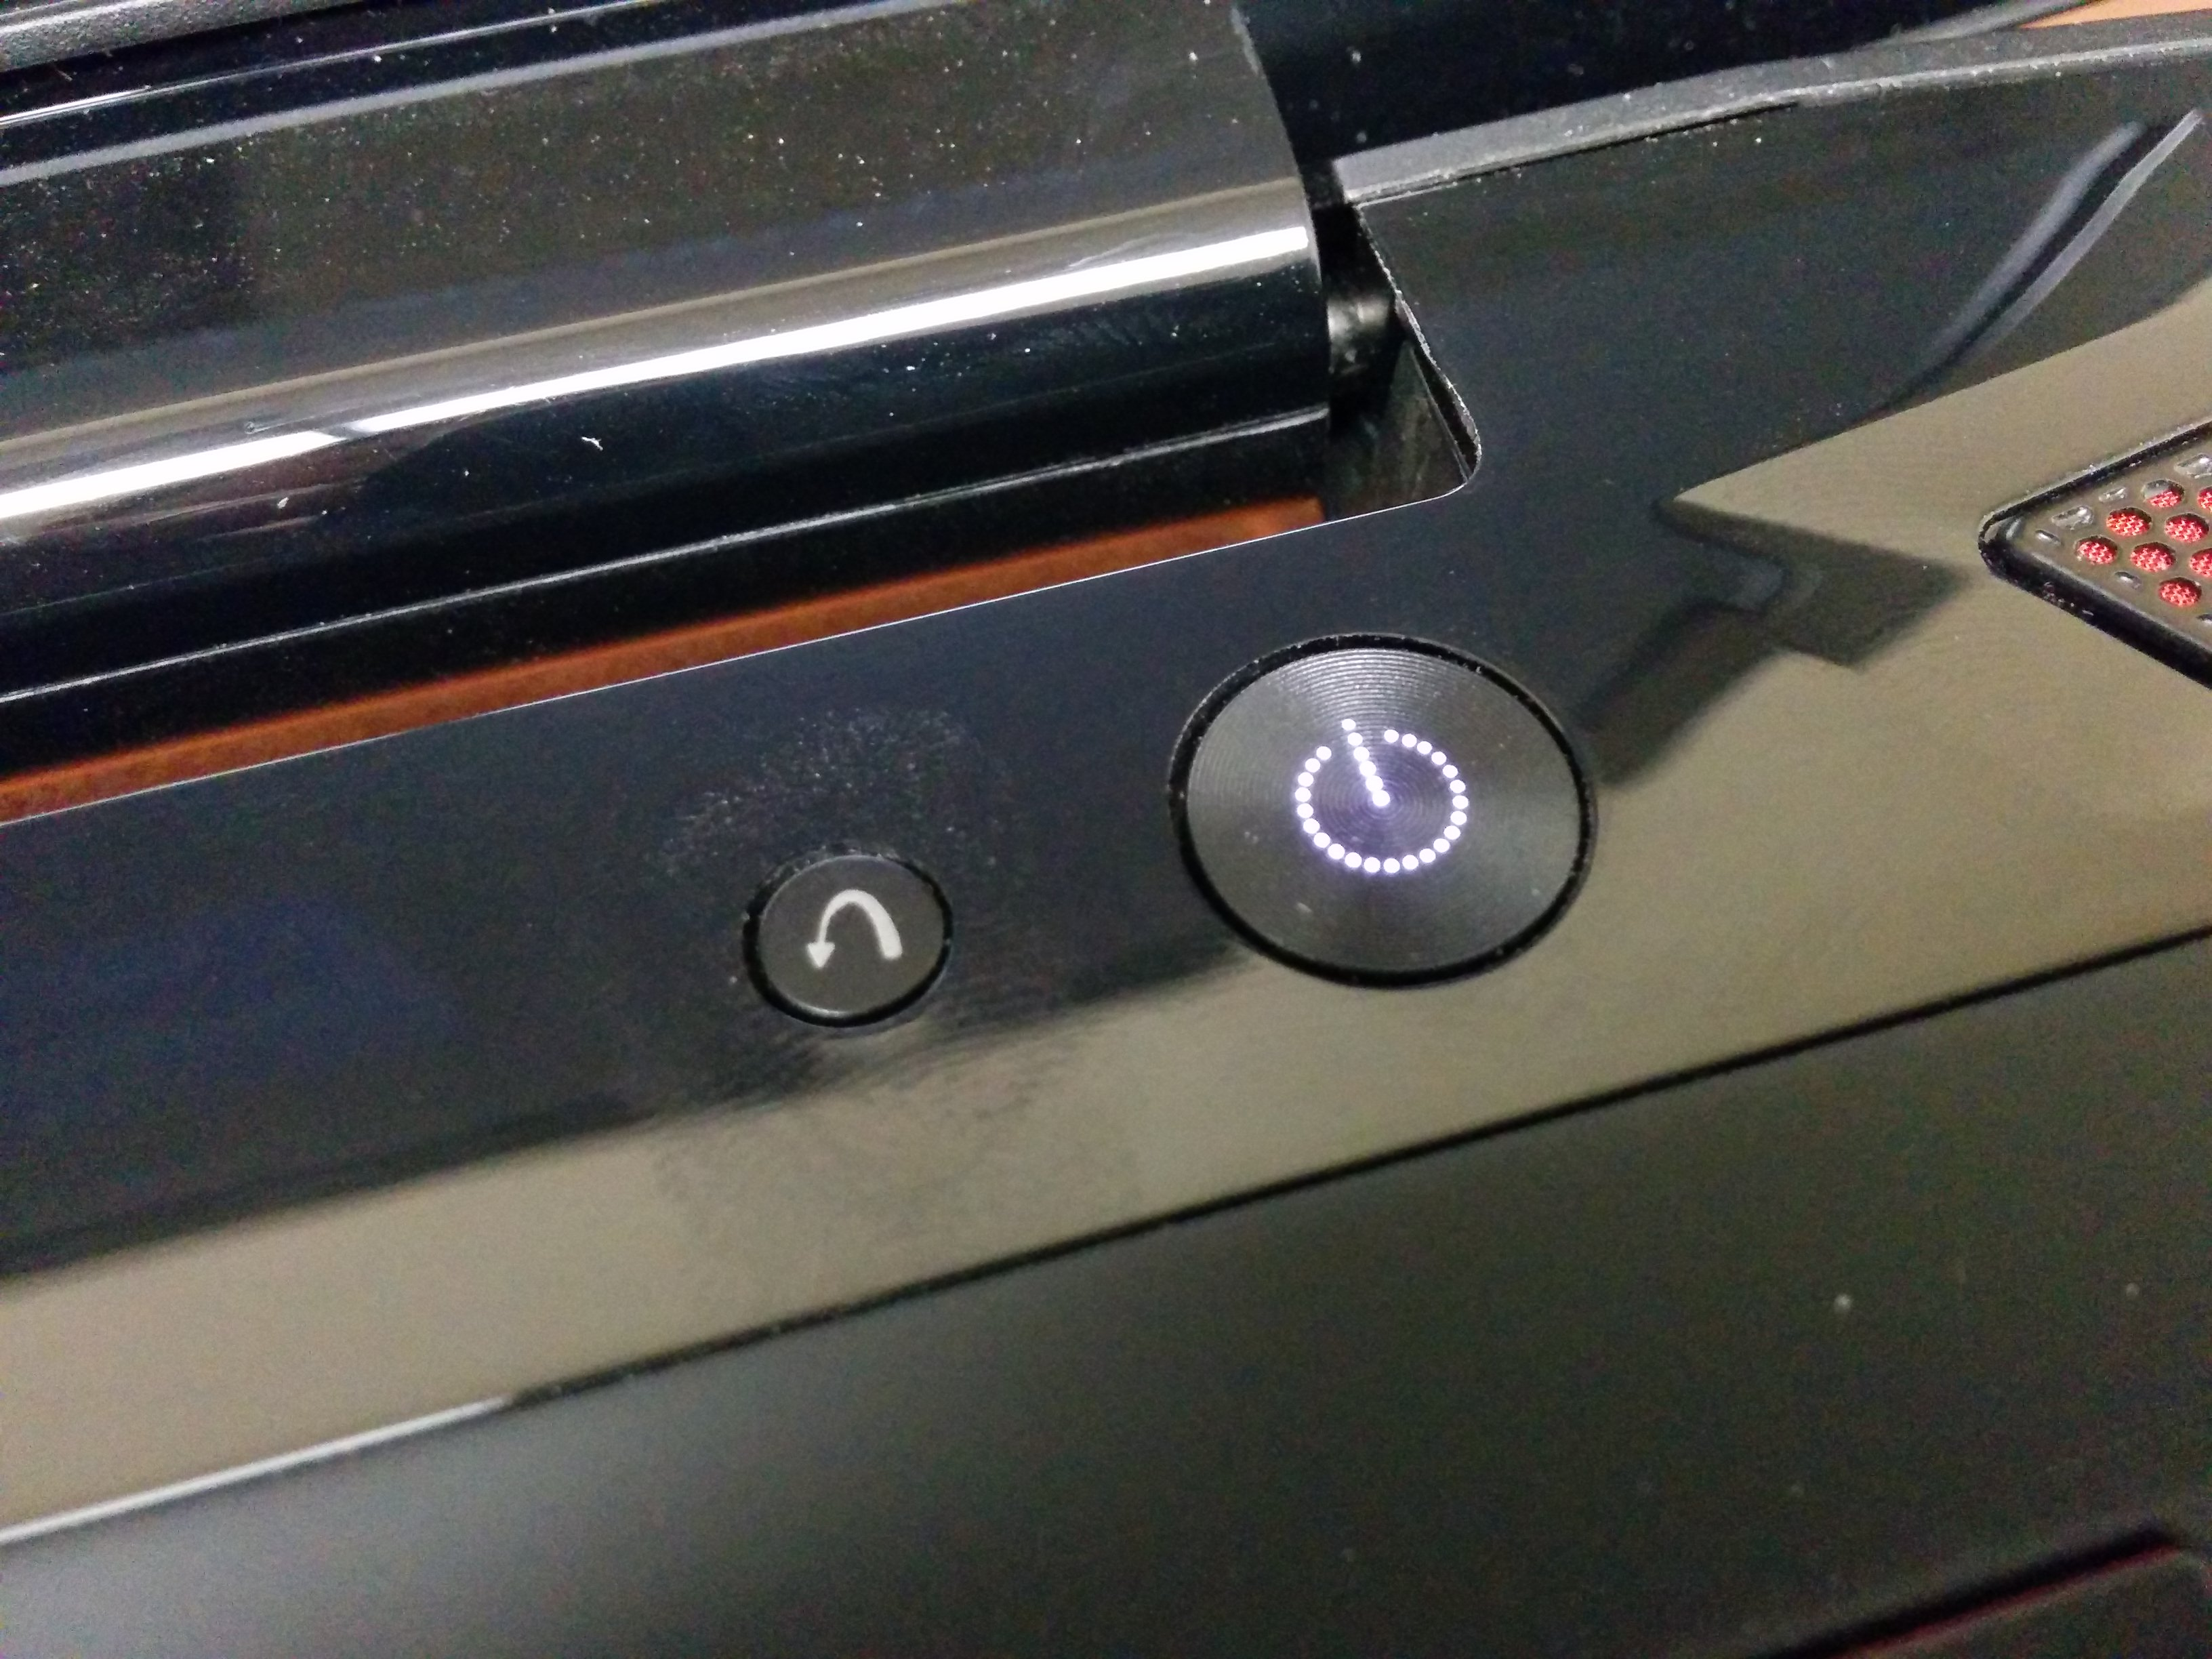 How to Enter the Lenovo Y50 BIOS